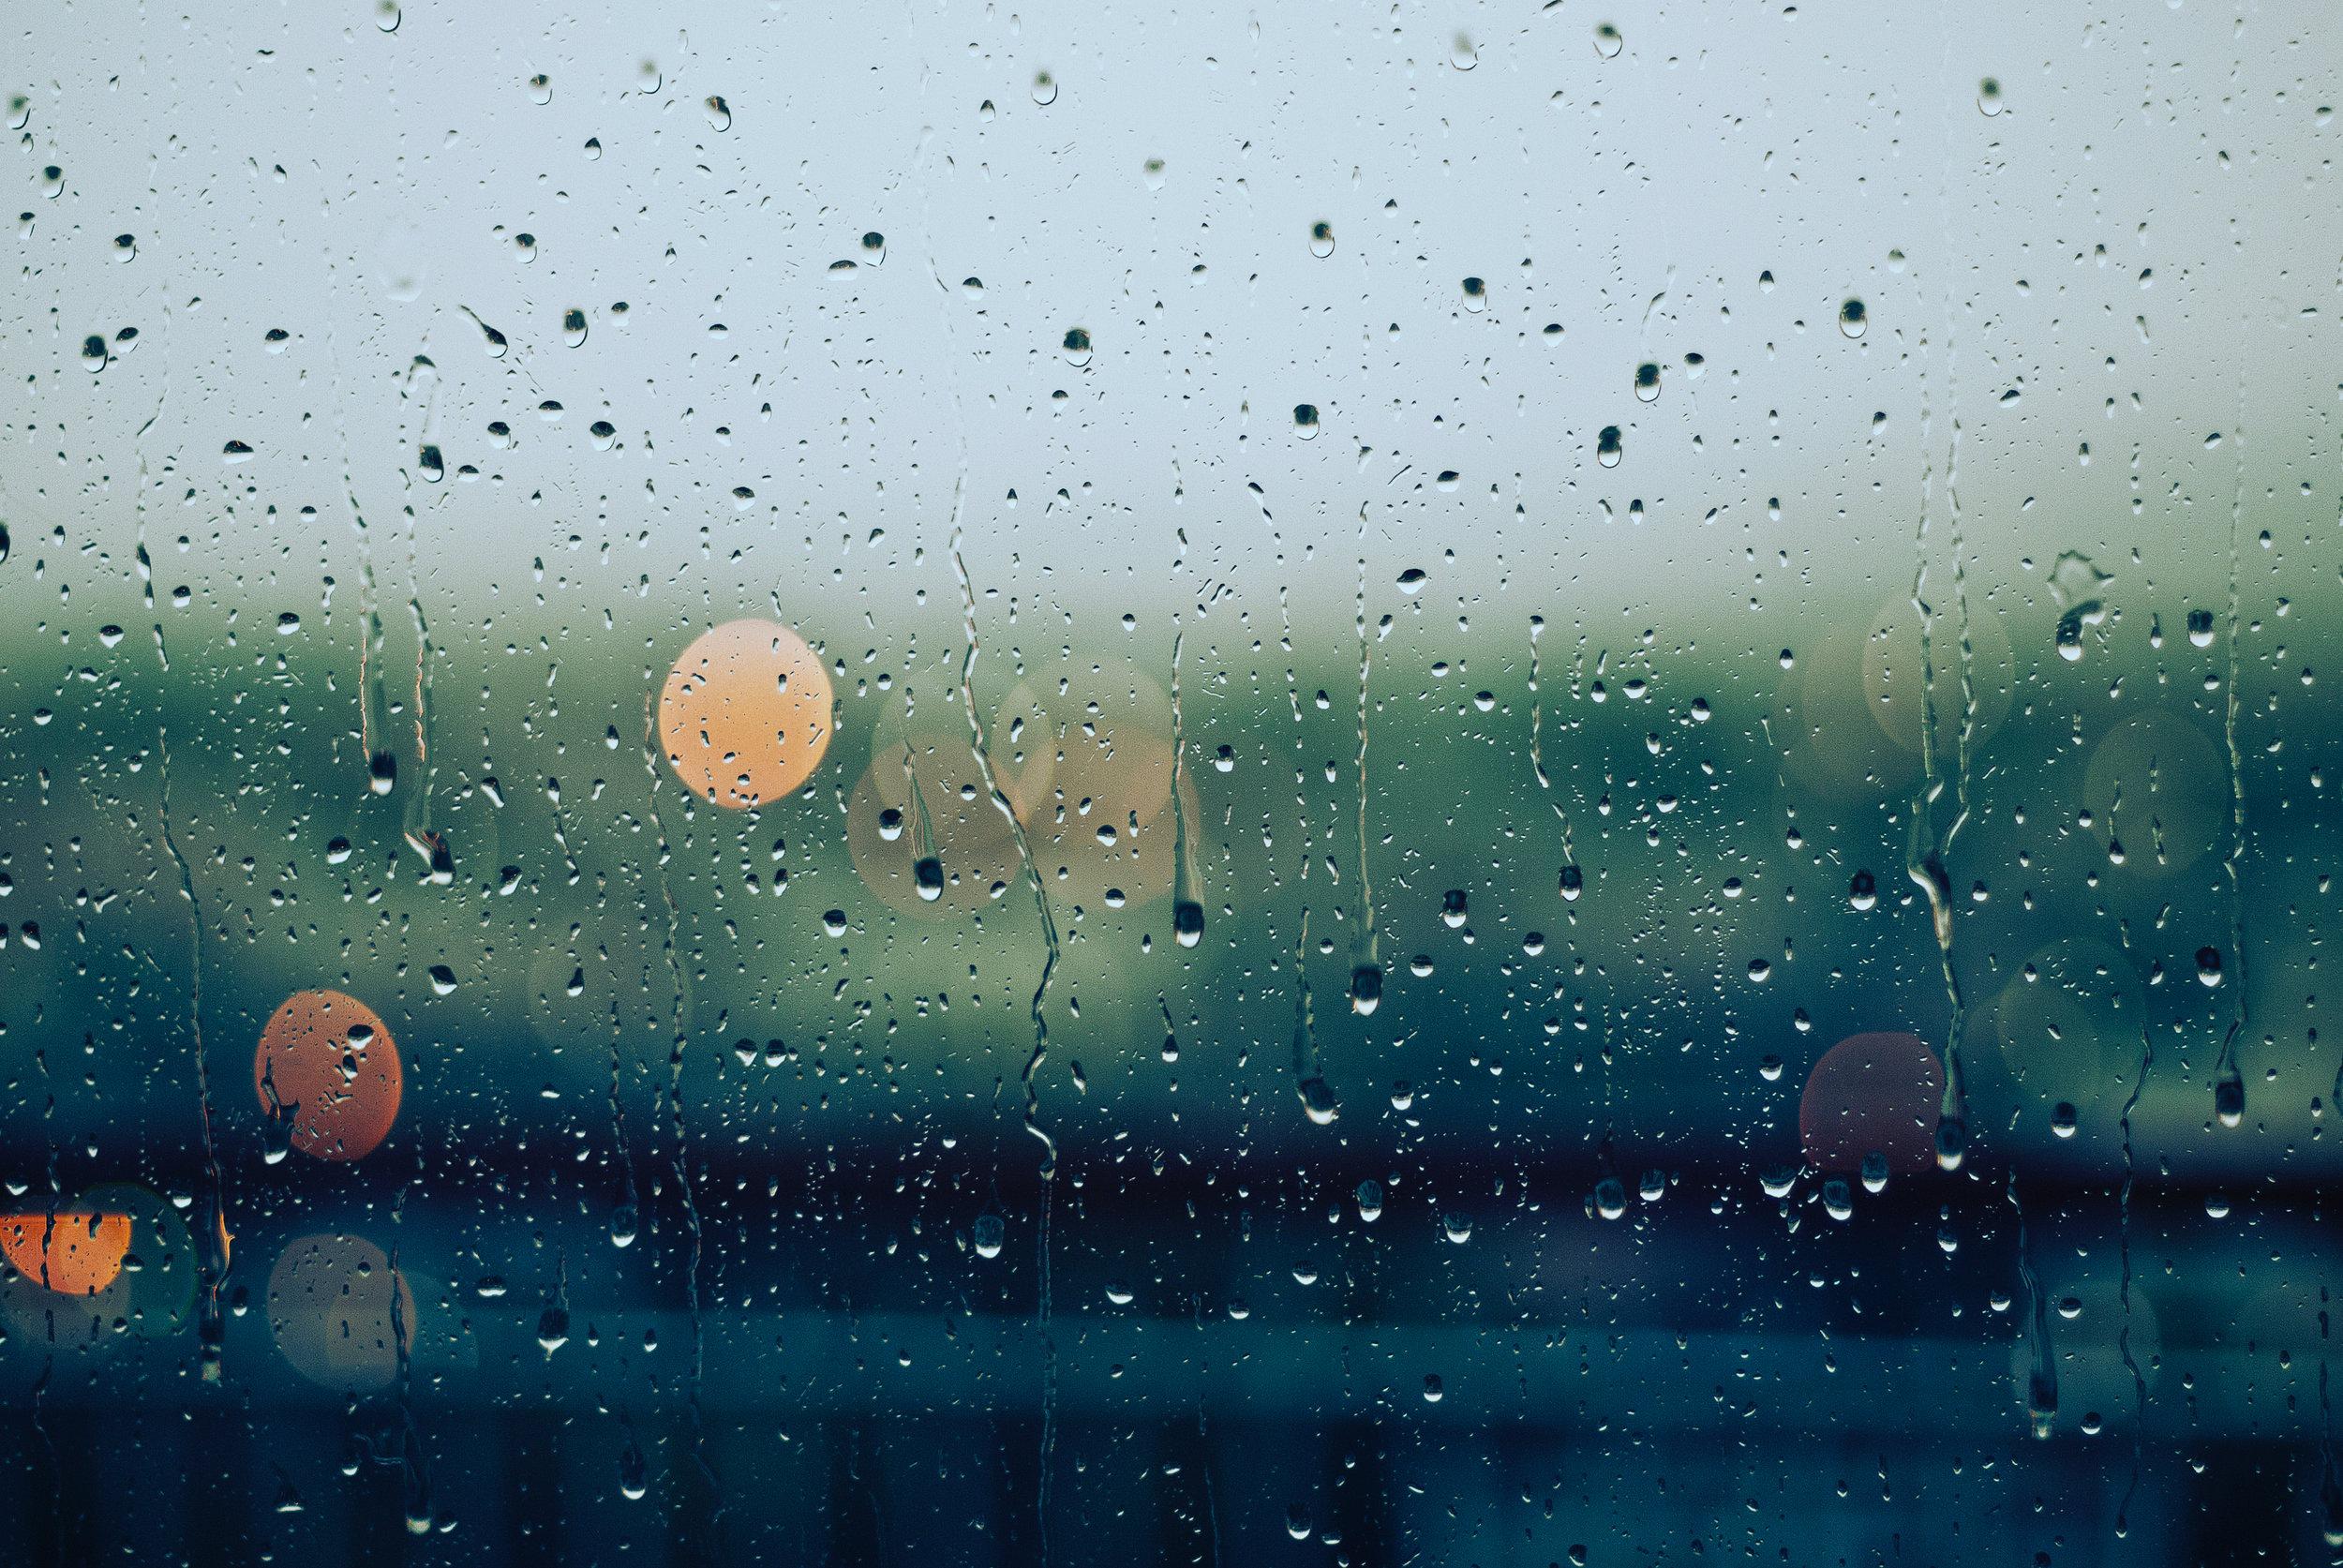 rain-on-window.jpg